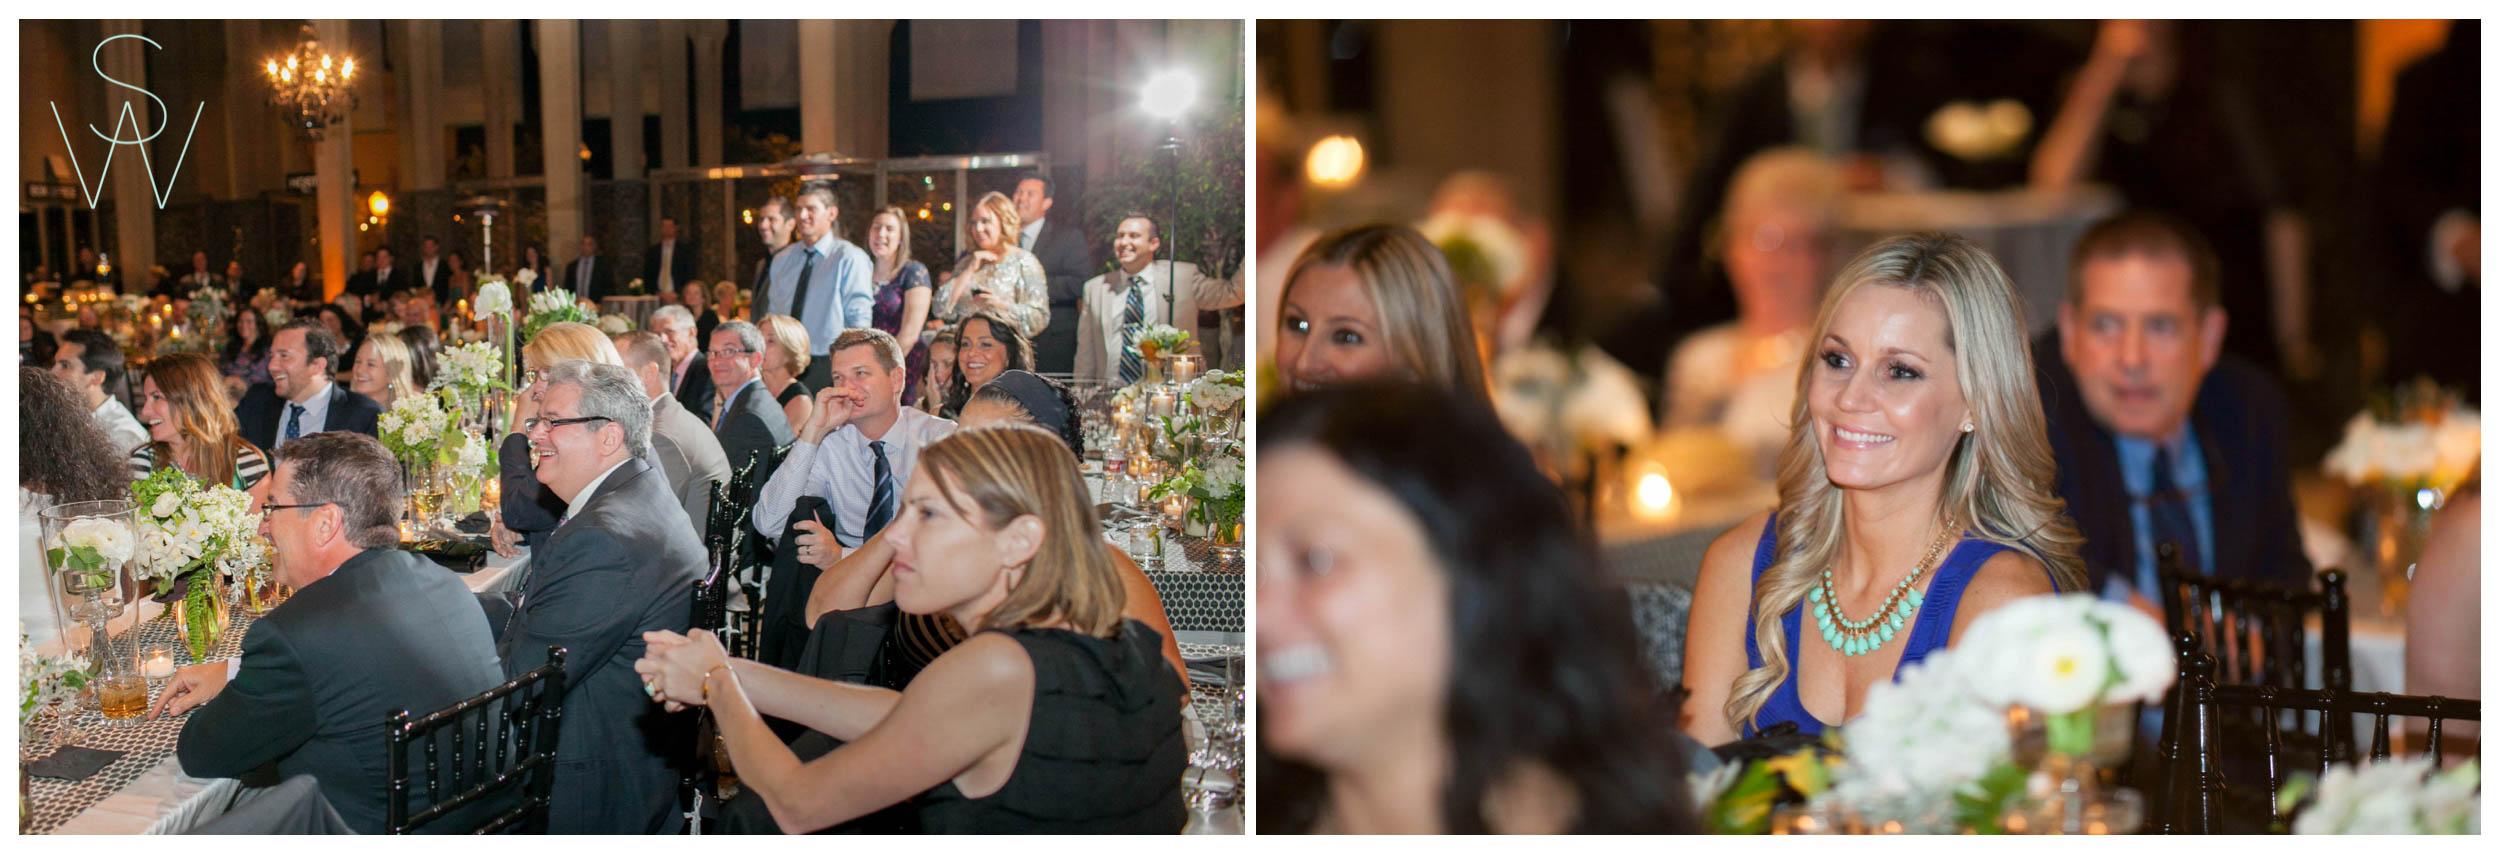 Shewanders.sdma_.wedding.photography-1092.jpg.wedding.photography-1092.jpg